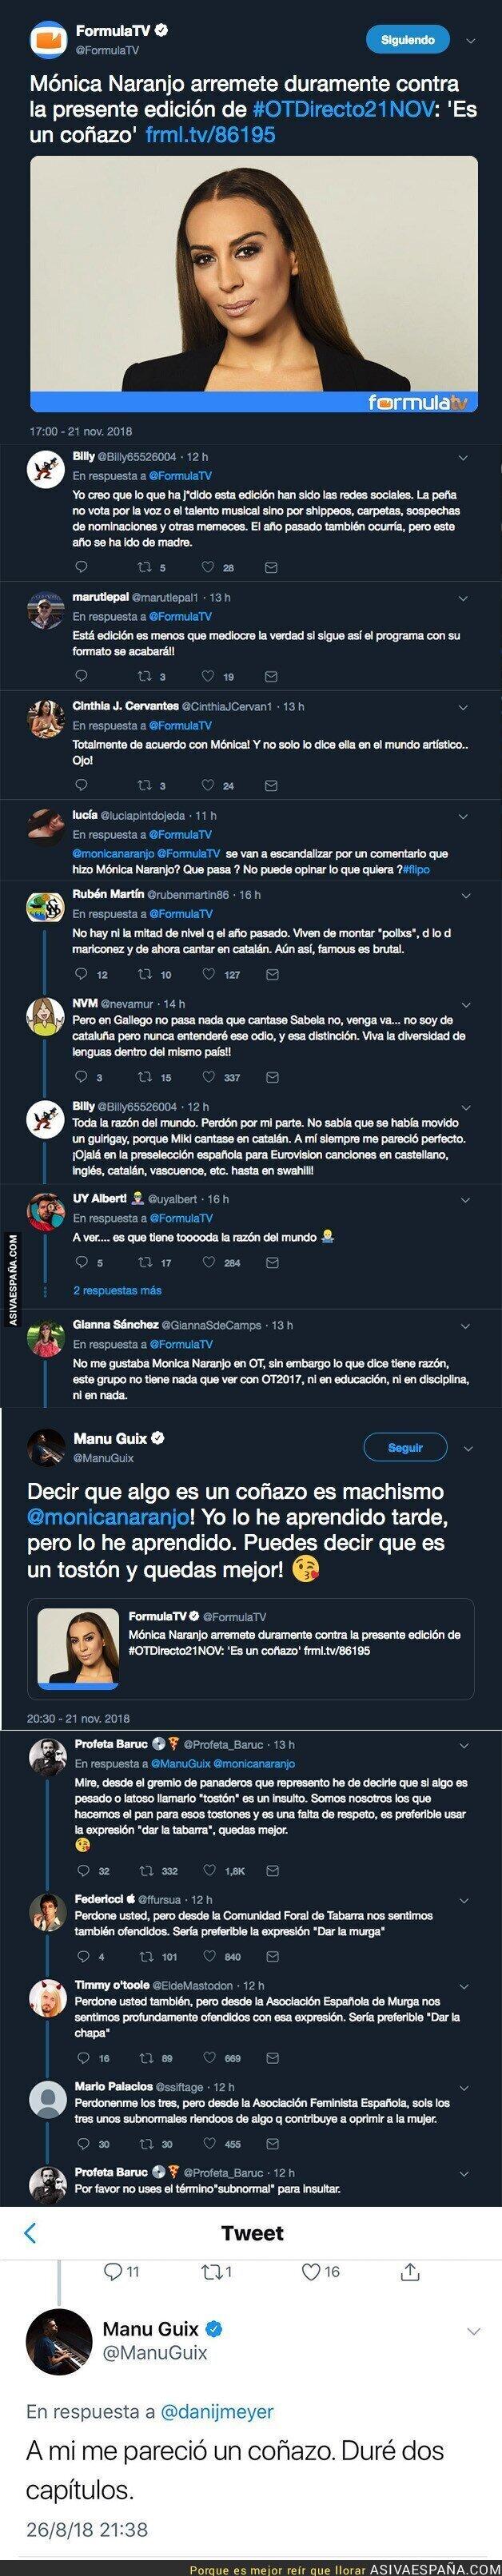 98612 - Mónica Naranjo salta a criticar a Operación Triunfo y Manu Guix sale a responder sin mucha suerte